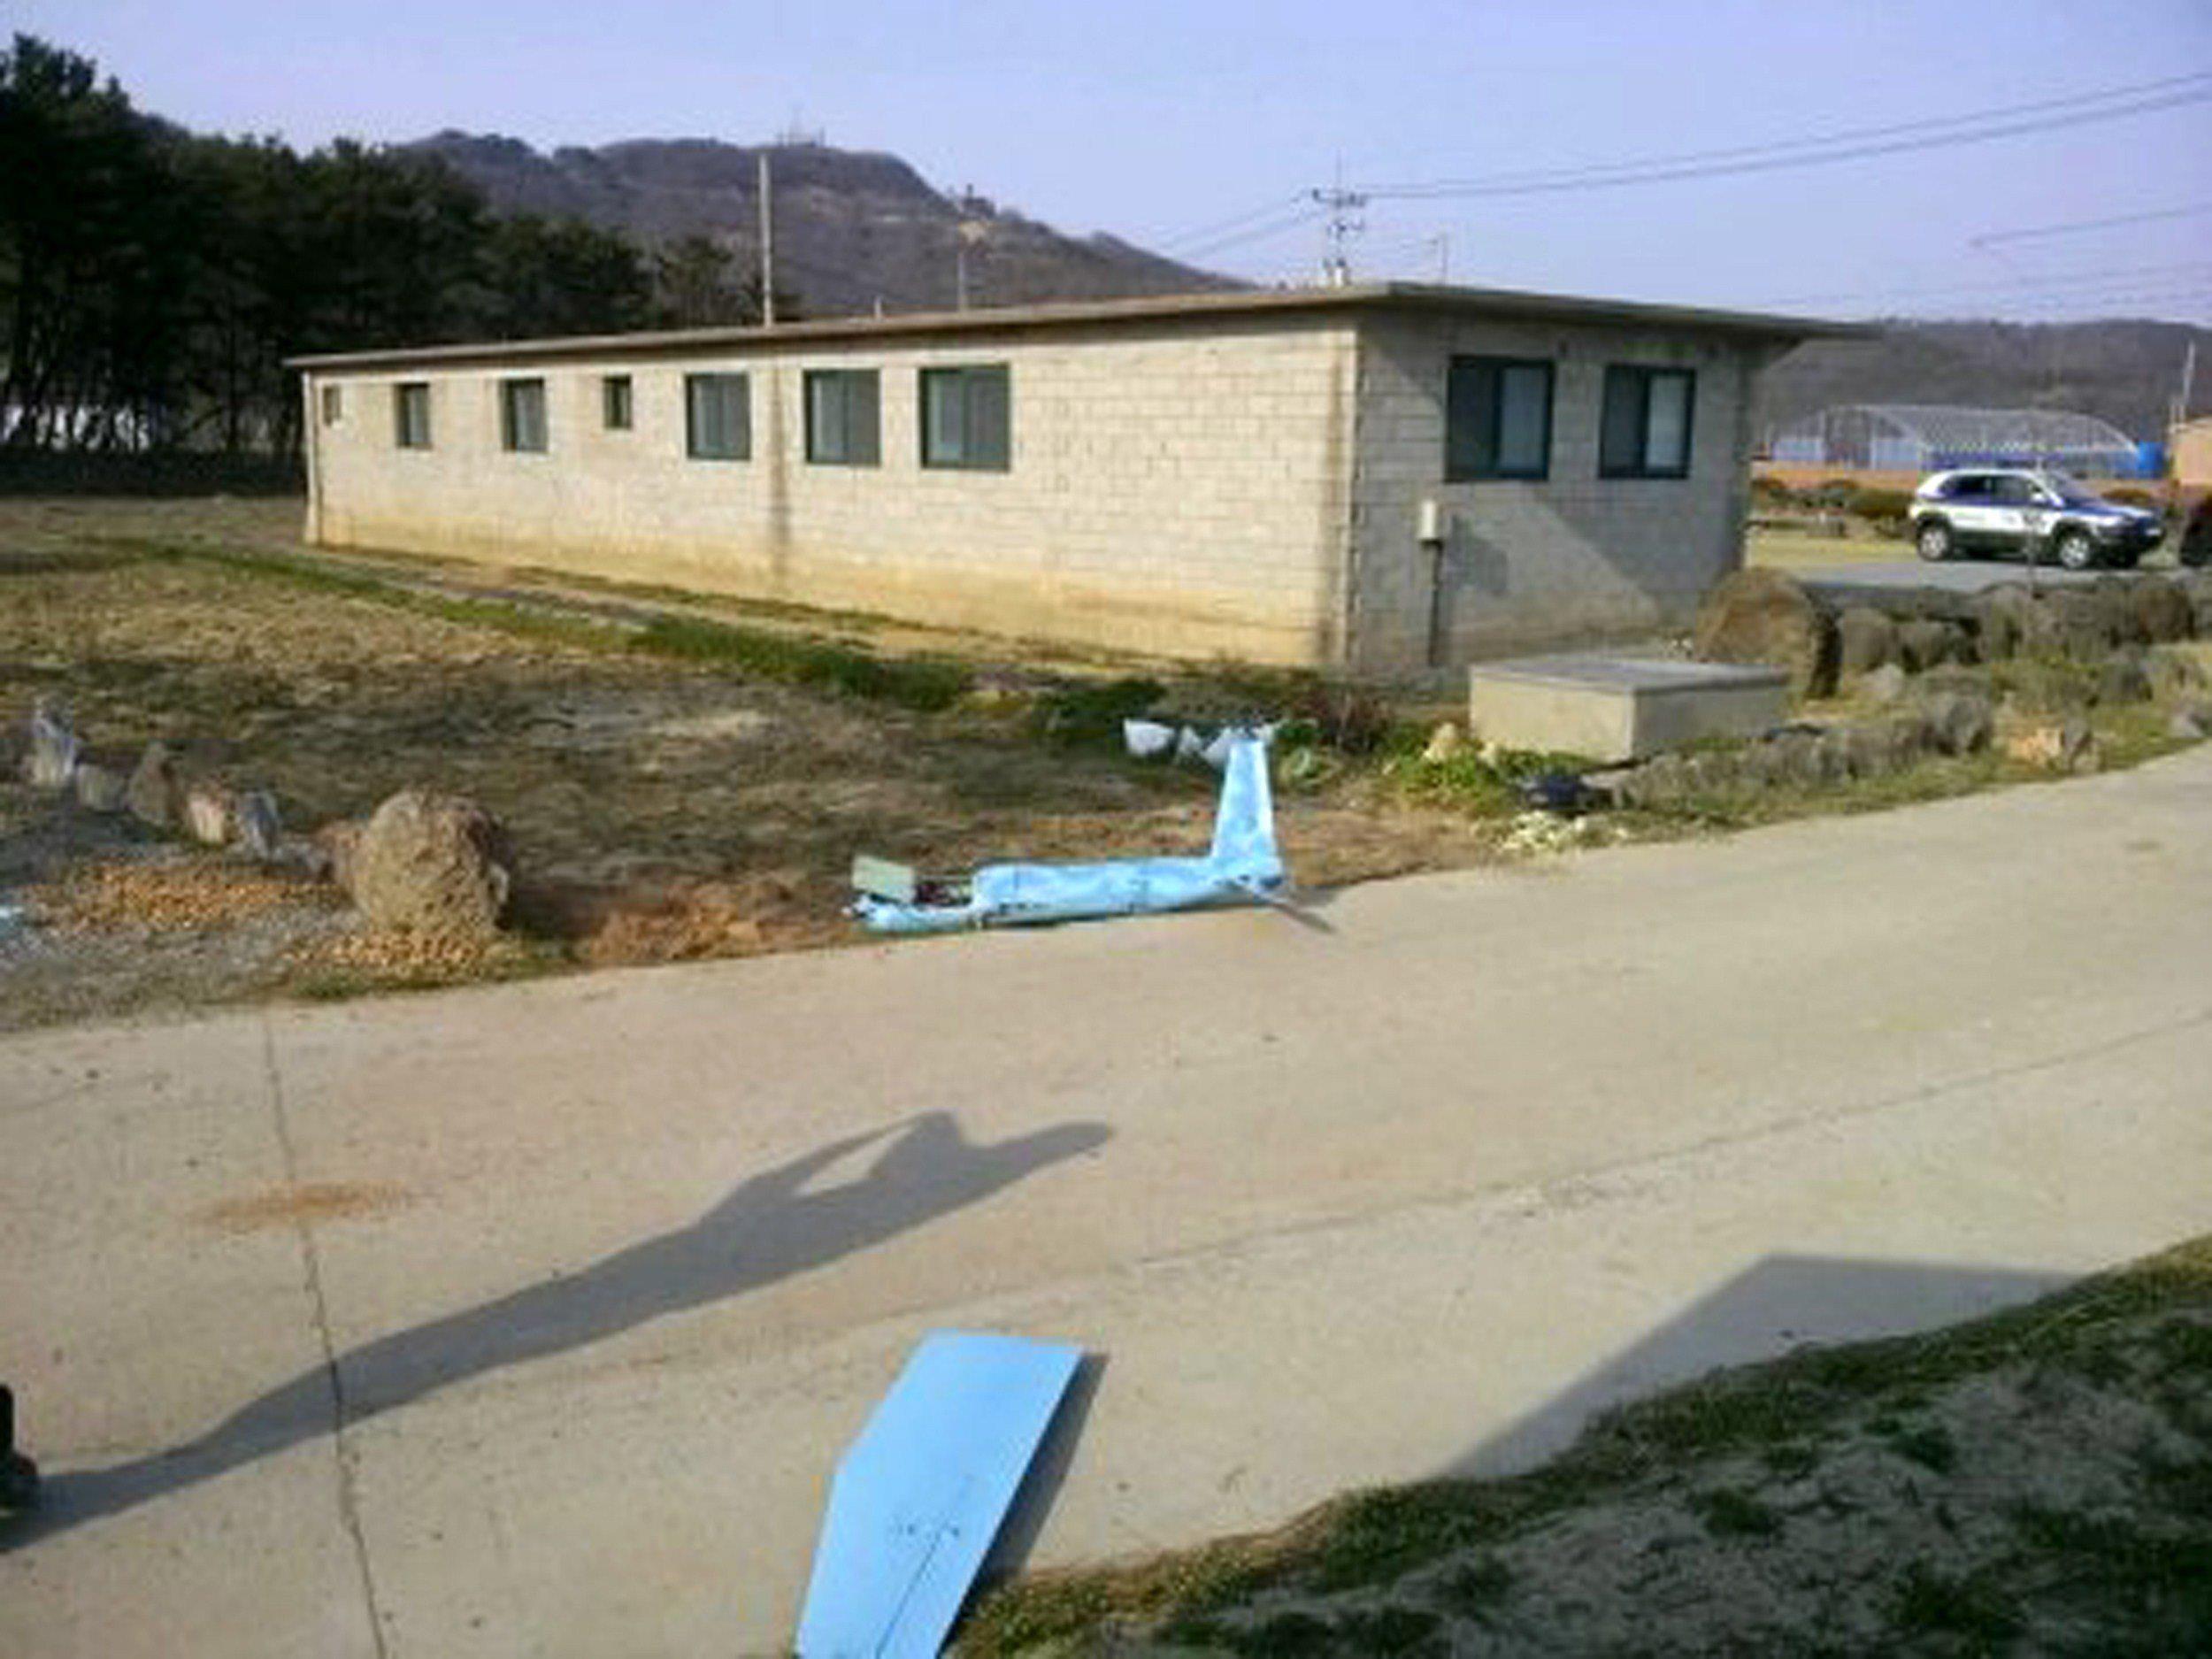 Image: Wreckage of a crashed drone on Baengnyeong island